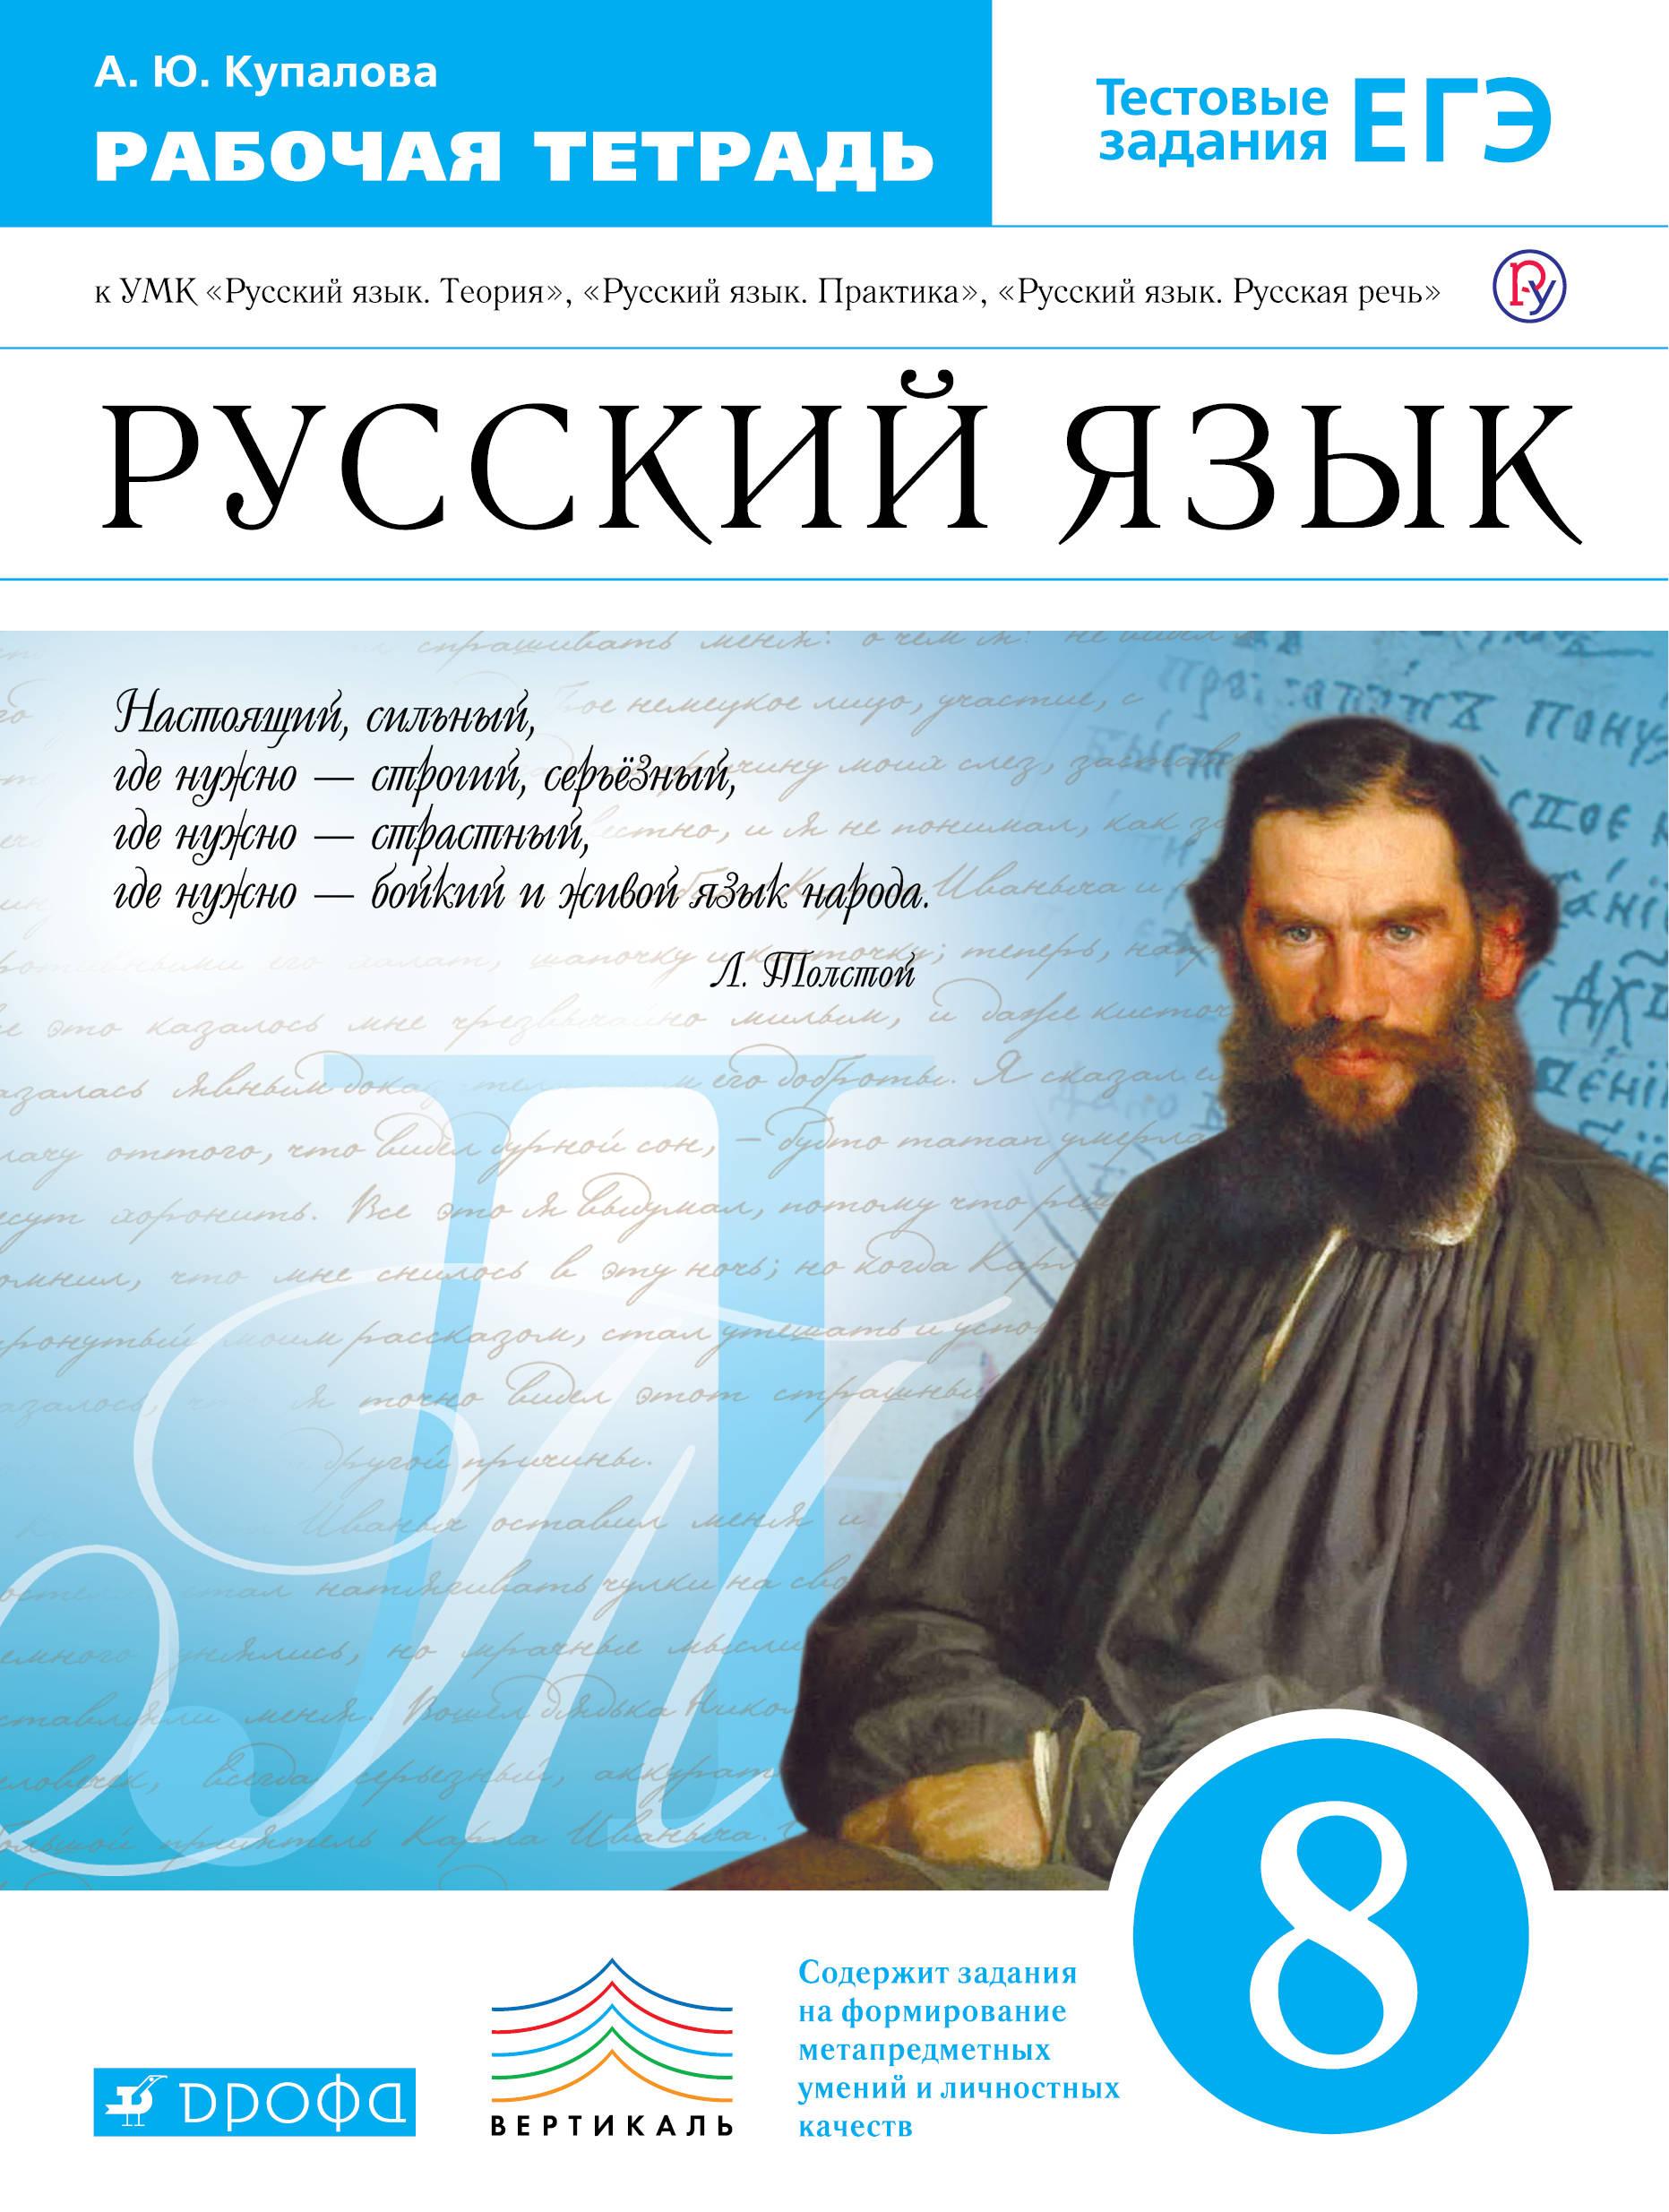 А. Ю. Купалова Русский язык. 8 класс. Рабочая тетрадь